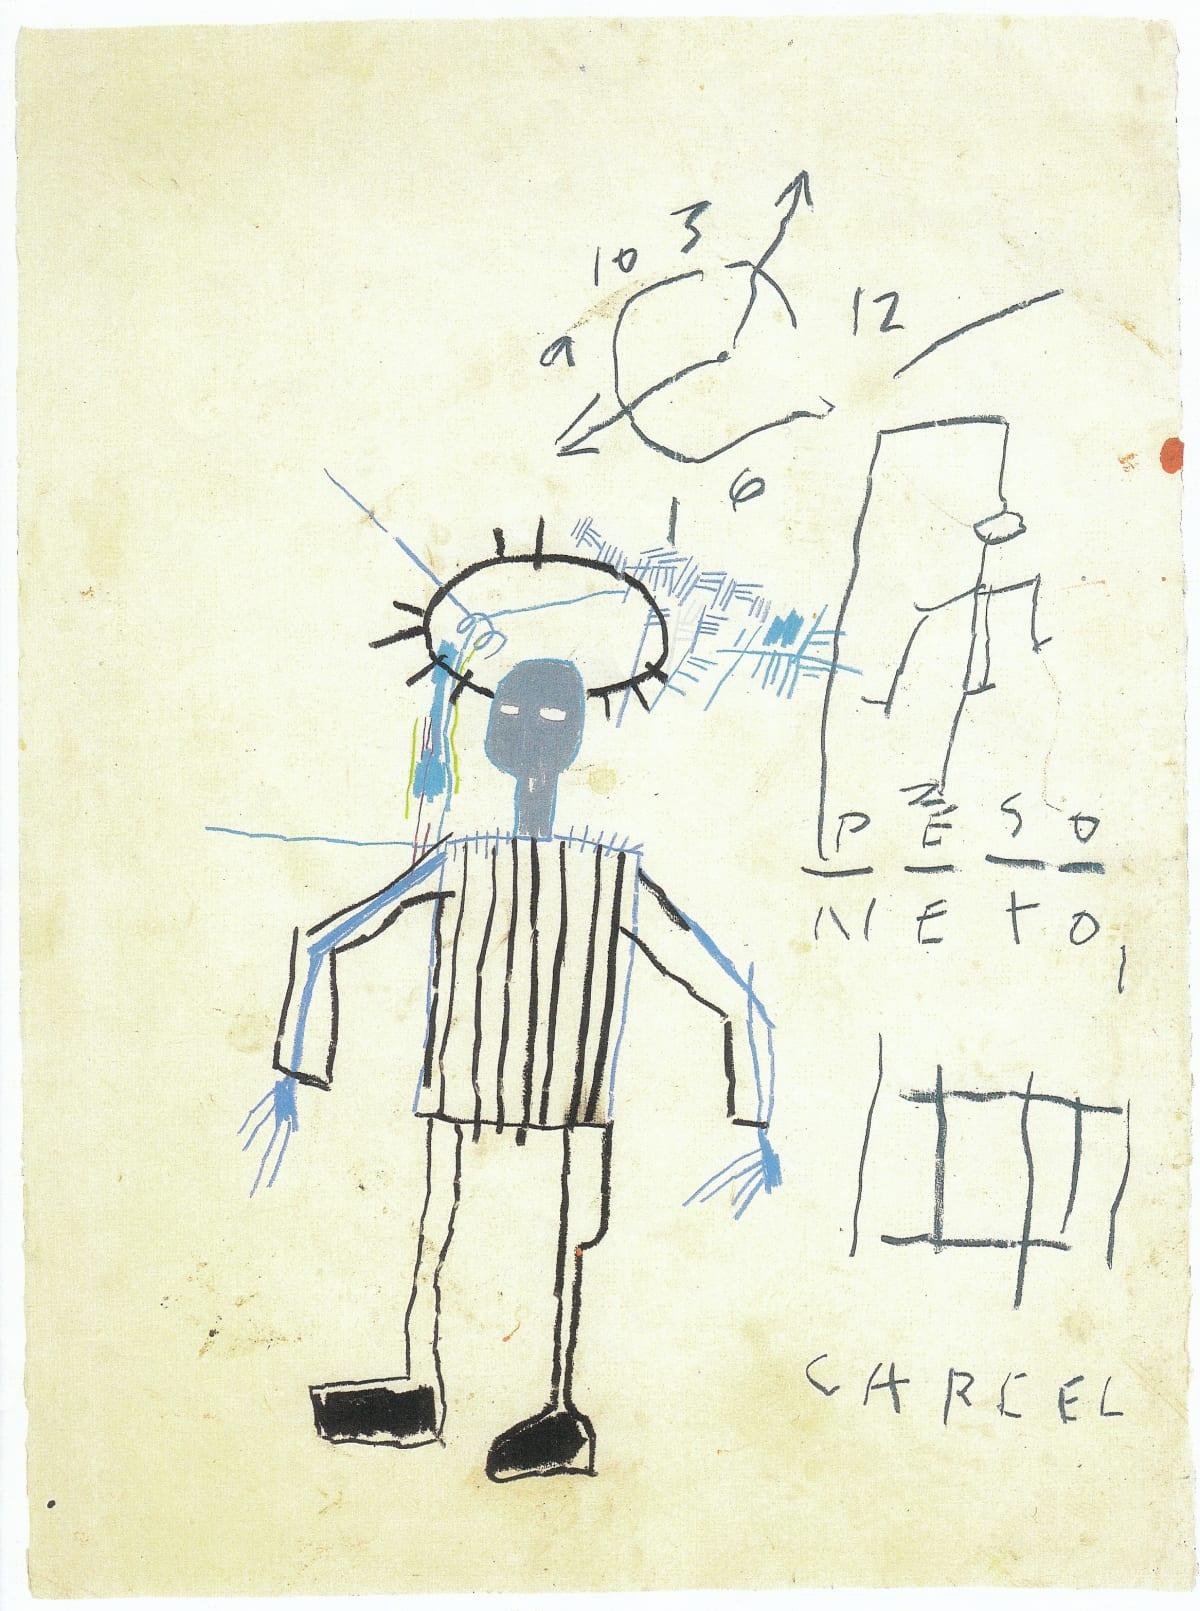 Jean-Michel Basquiat Untitled (Peso Neto), 1981 Crayon on Notebook Paper 76.2 x 56.5 cm